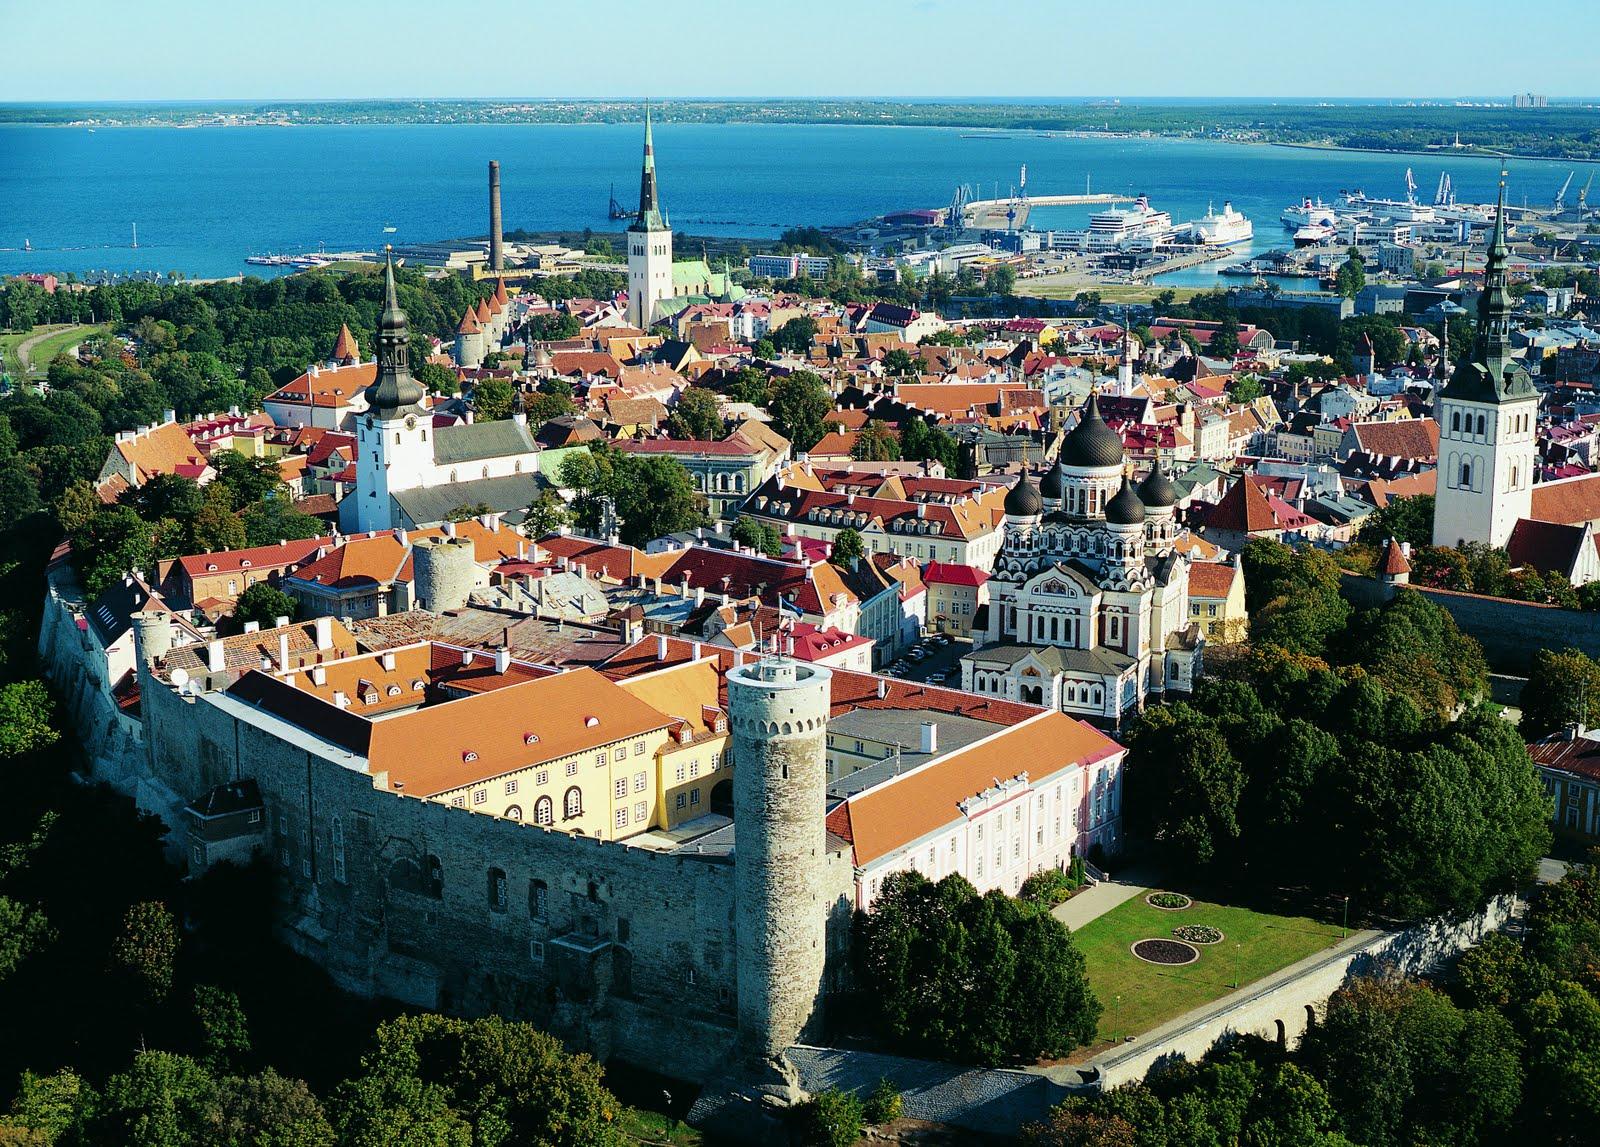 Tallink City